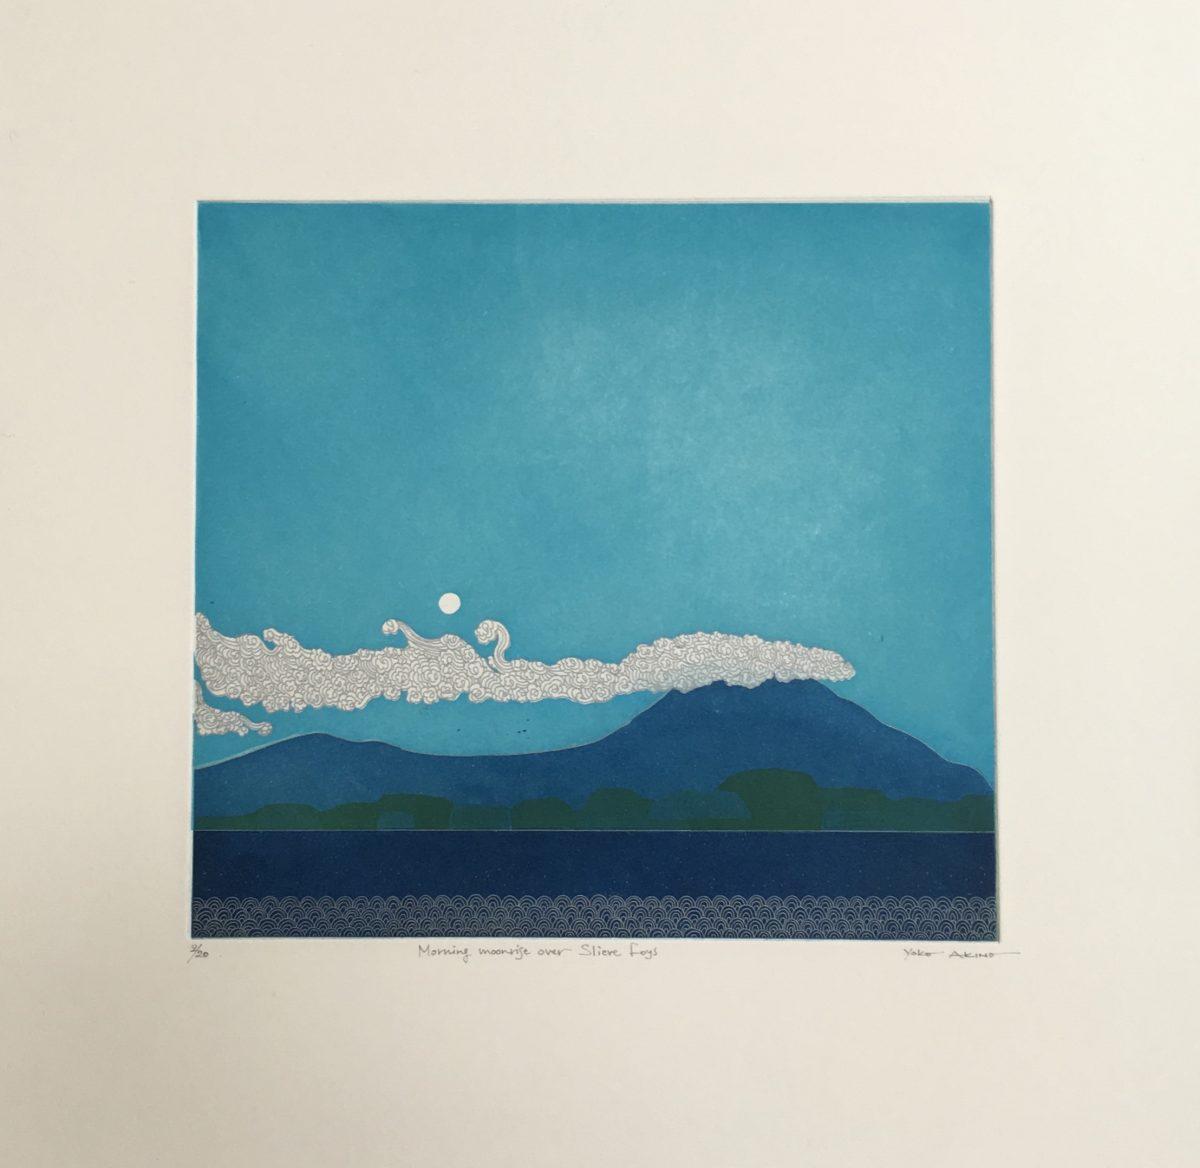 Morning moonrise over Slieve Foys, Yoko Akino